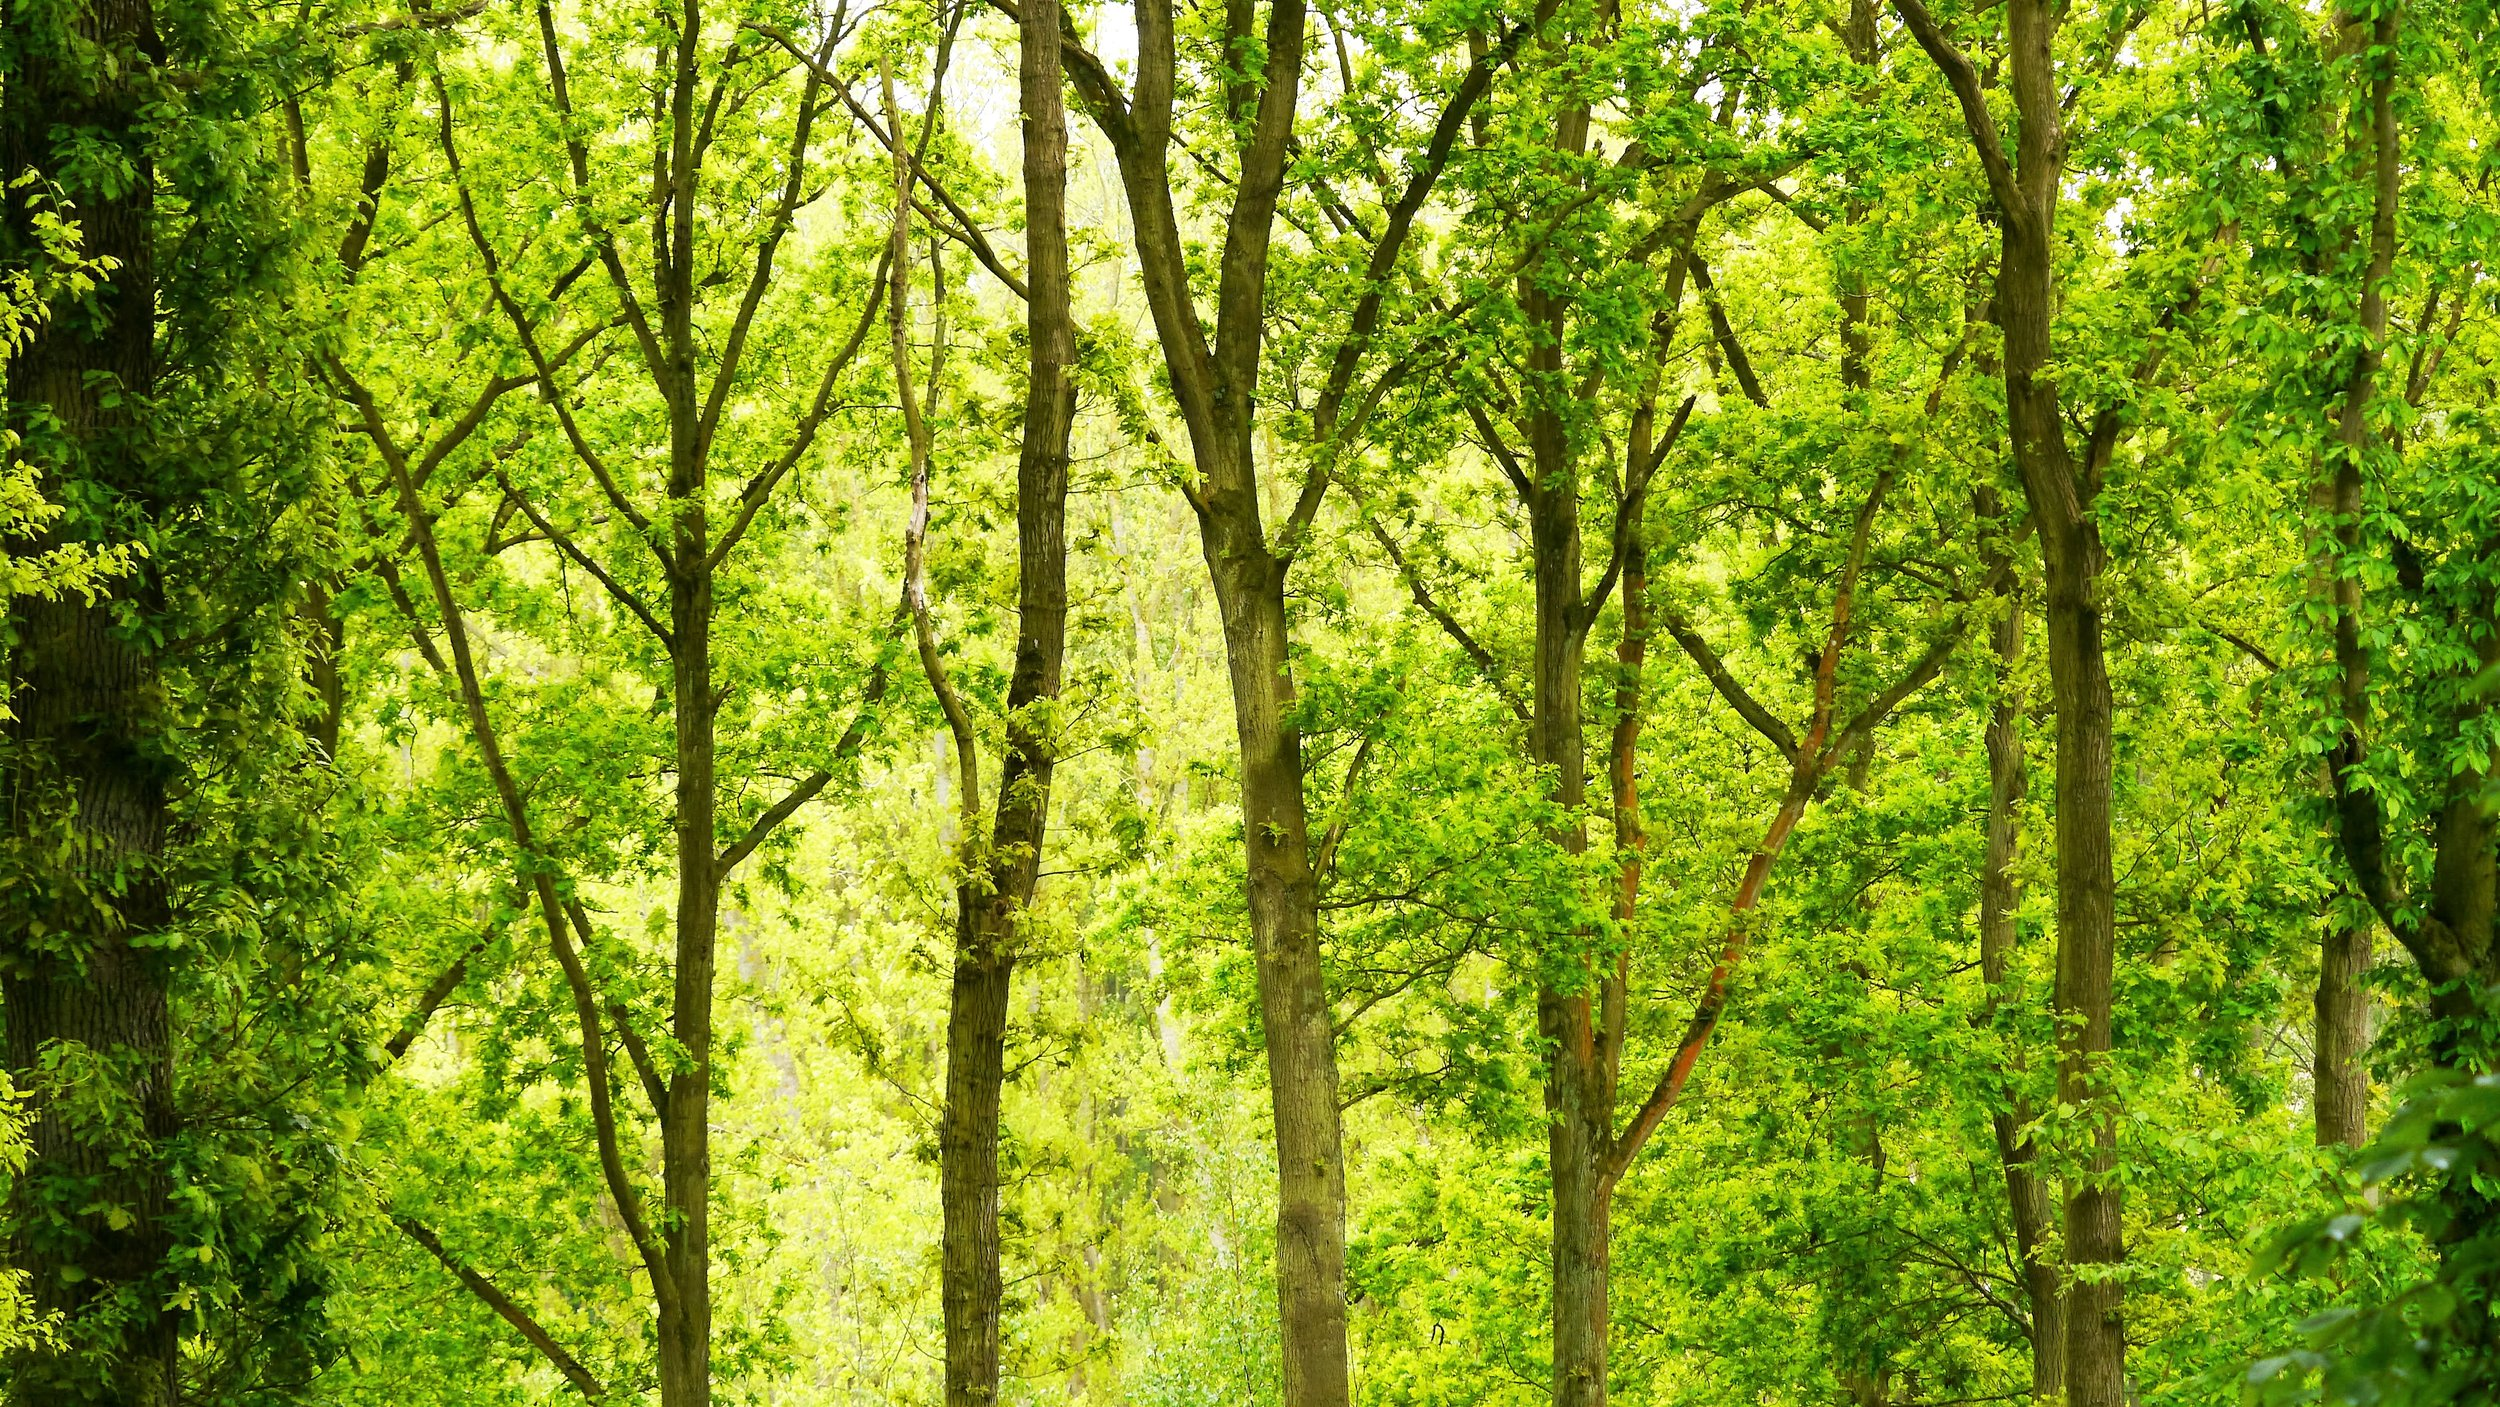 green-forest-daytime-trees-brussels-tree-1576721-pxhere.com.jpg